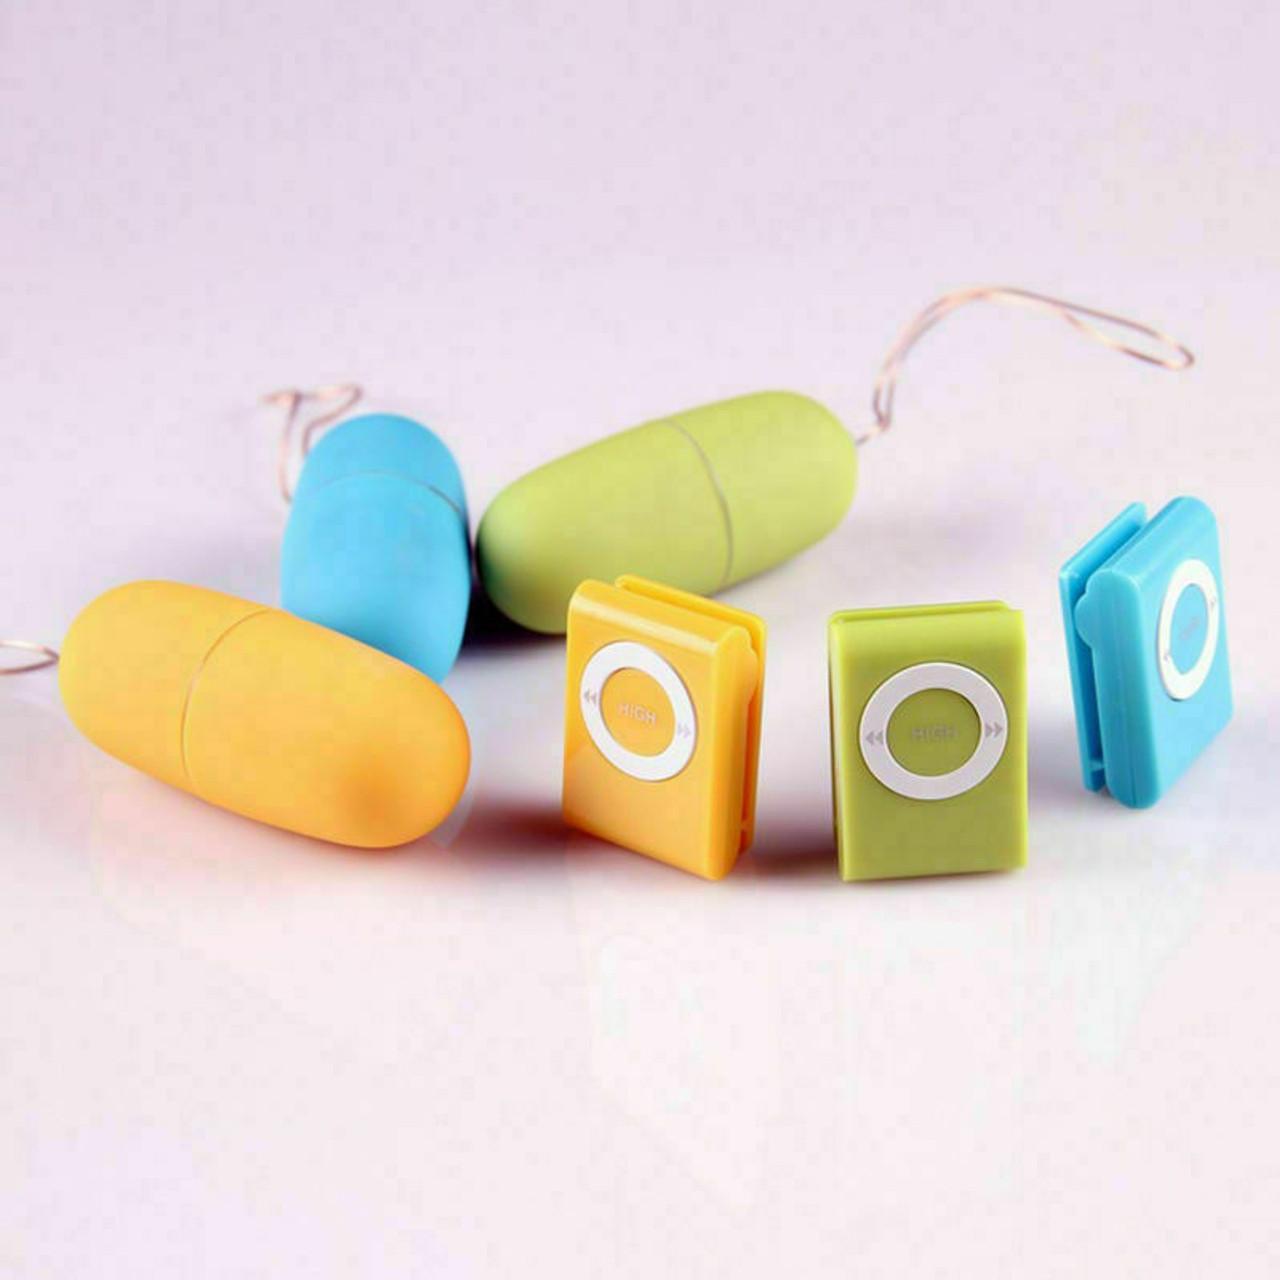 Wireless Remote Control Vibrating Egg Bullet Vibrator Massager Adult Sex Toys